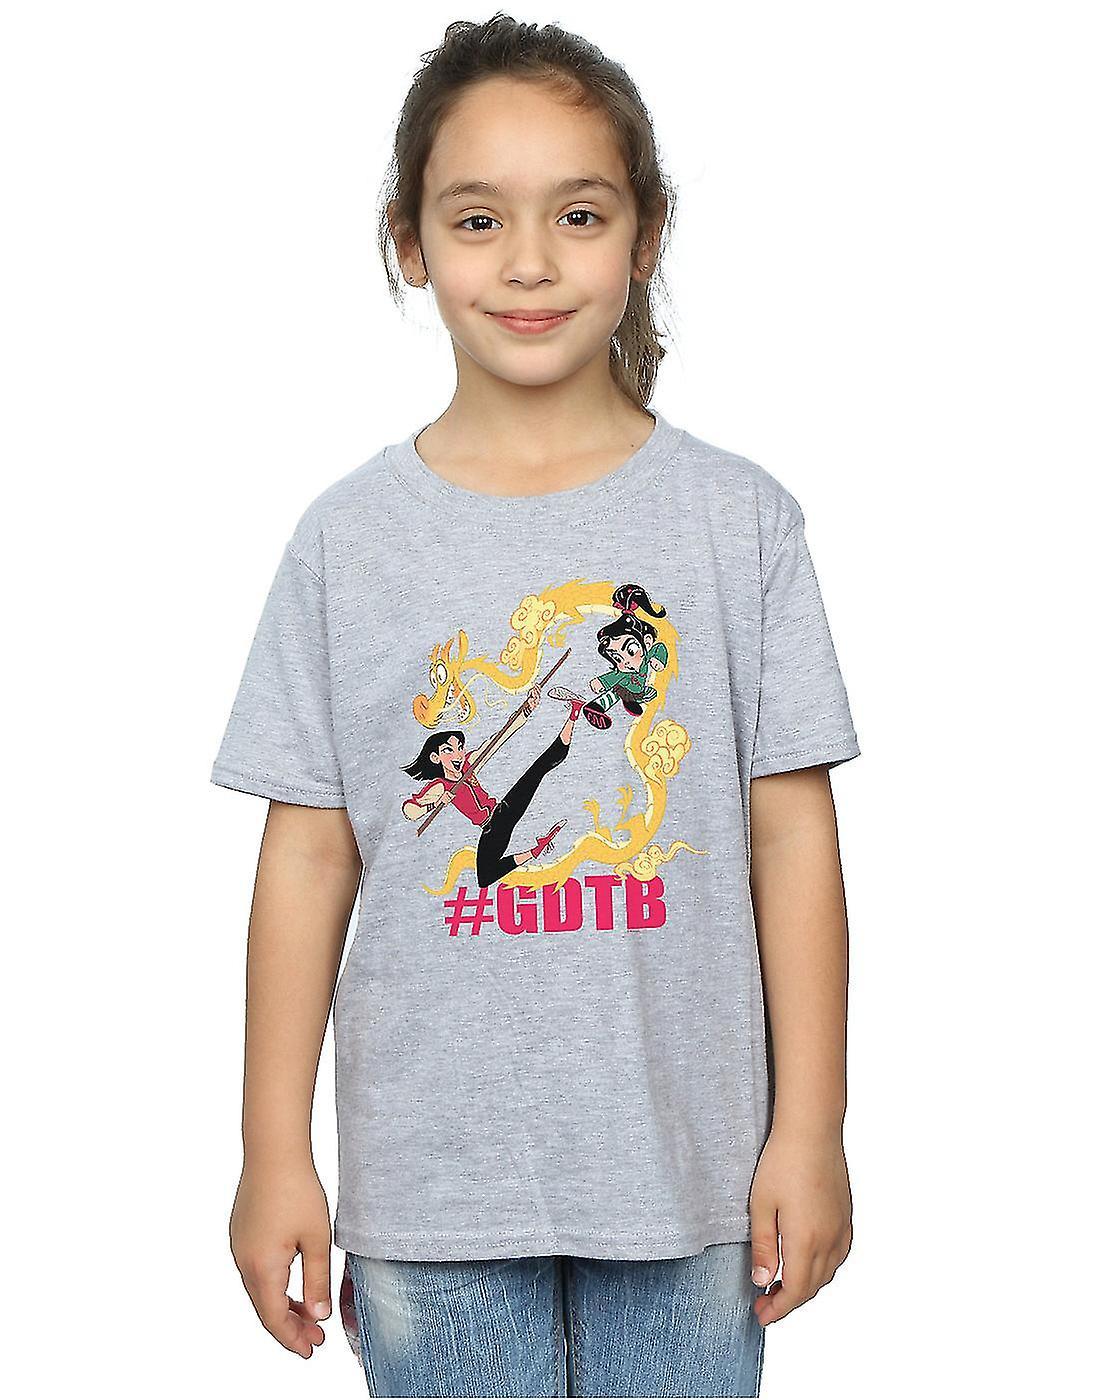 Disney Girls Wreck It Ralph Mulan And Vanellope T-Shirt